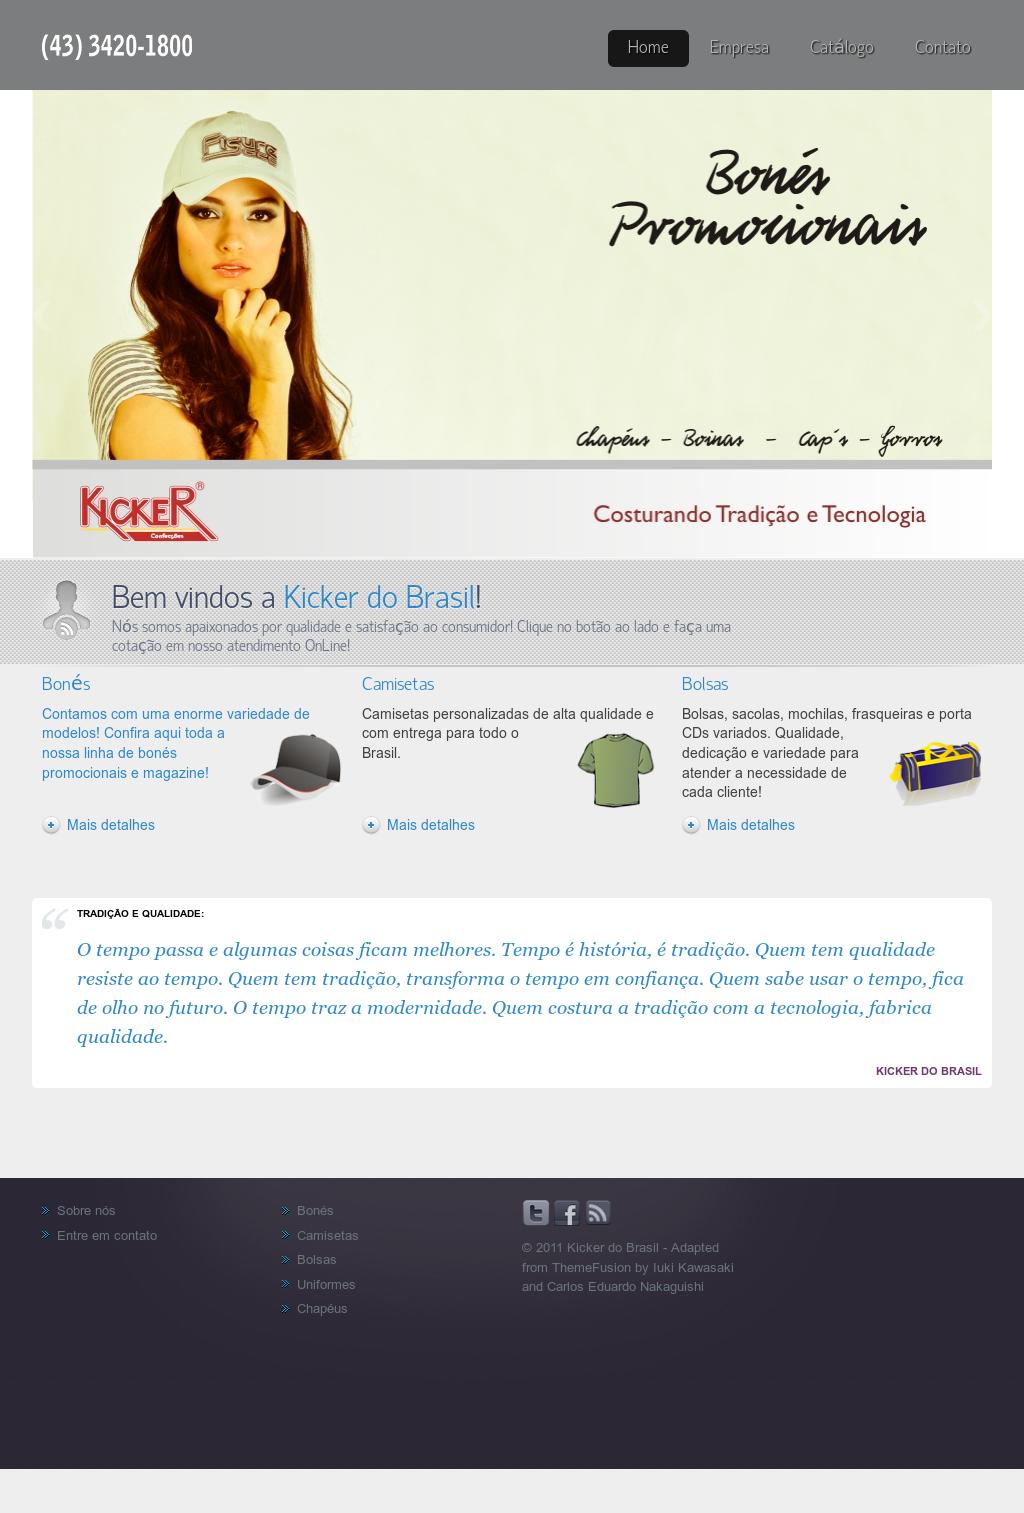 Kicker Industria E Comercio De Confeccoes Ltda Competitors 789b7cb48d6